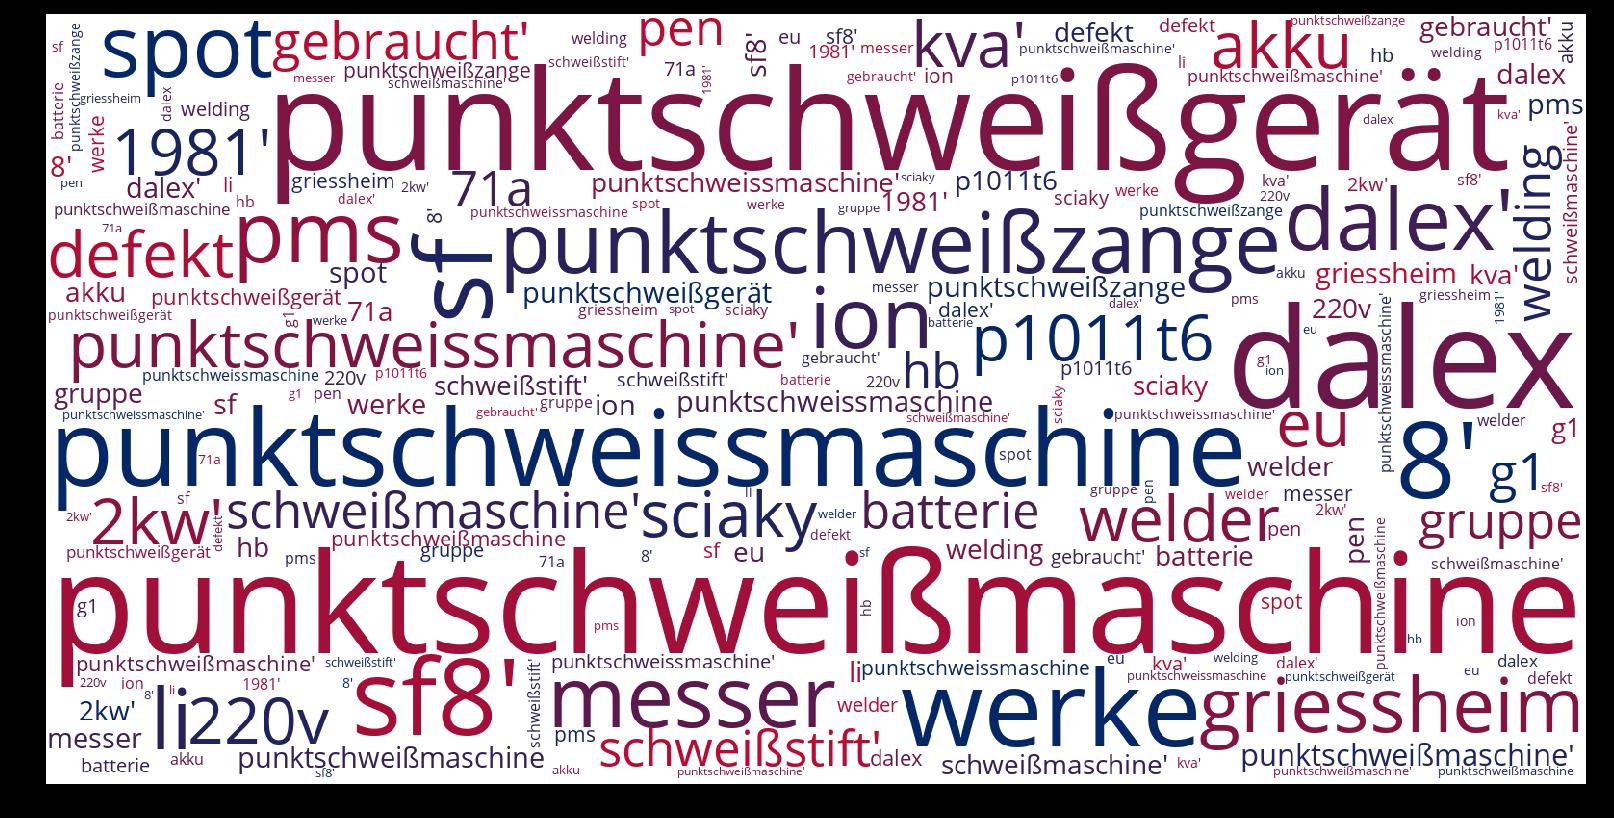 Punktschweissmaschine-wordcloud